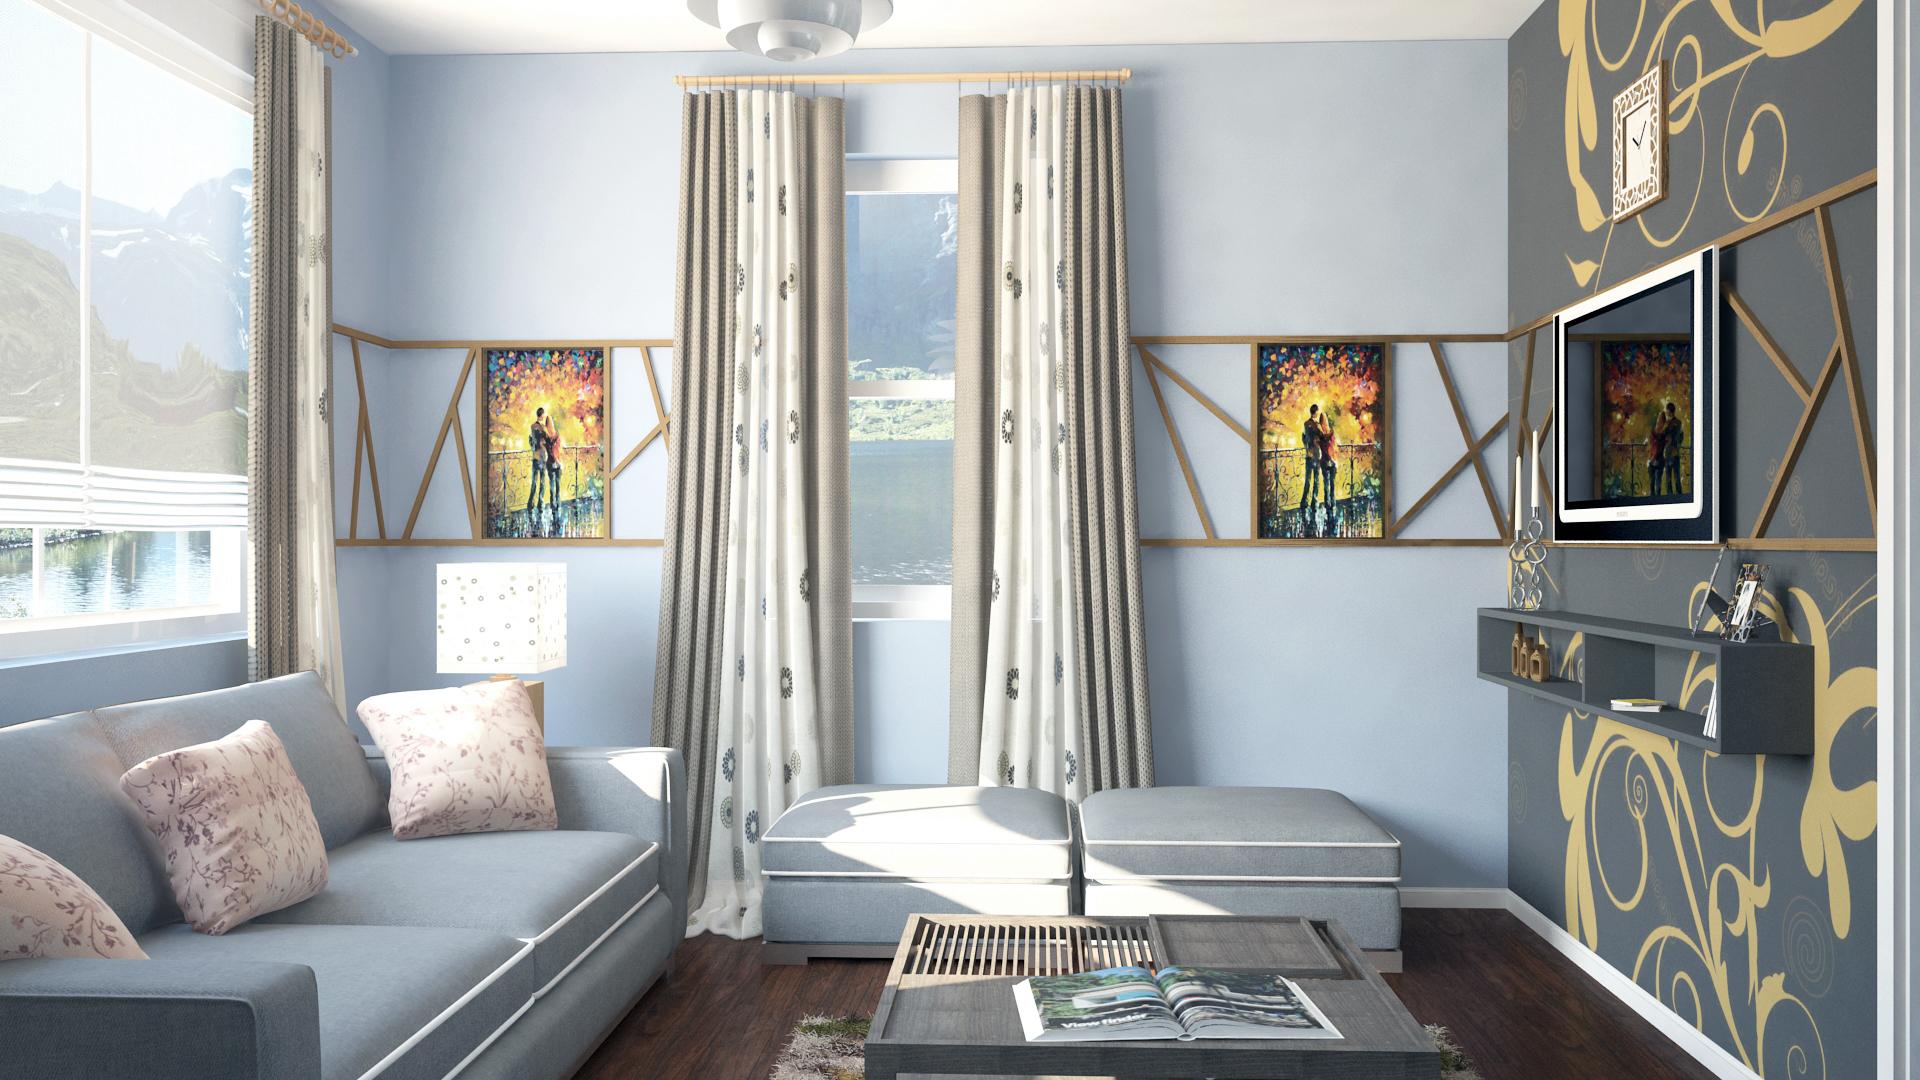 Interior Living Room Design Project Designed By Irakli Jokhadze Interior Design Of Small